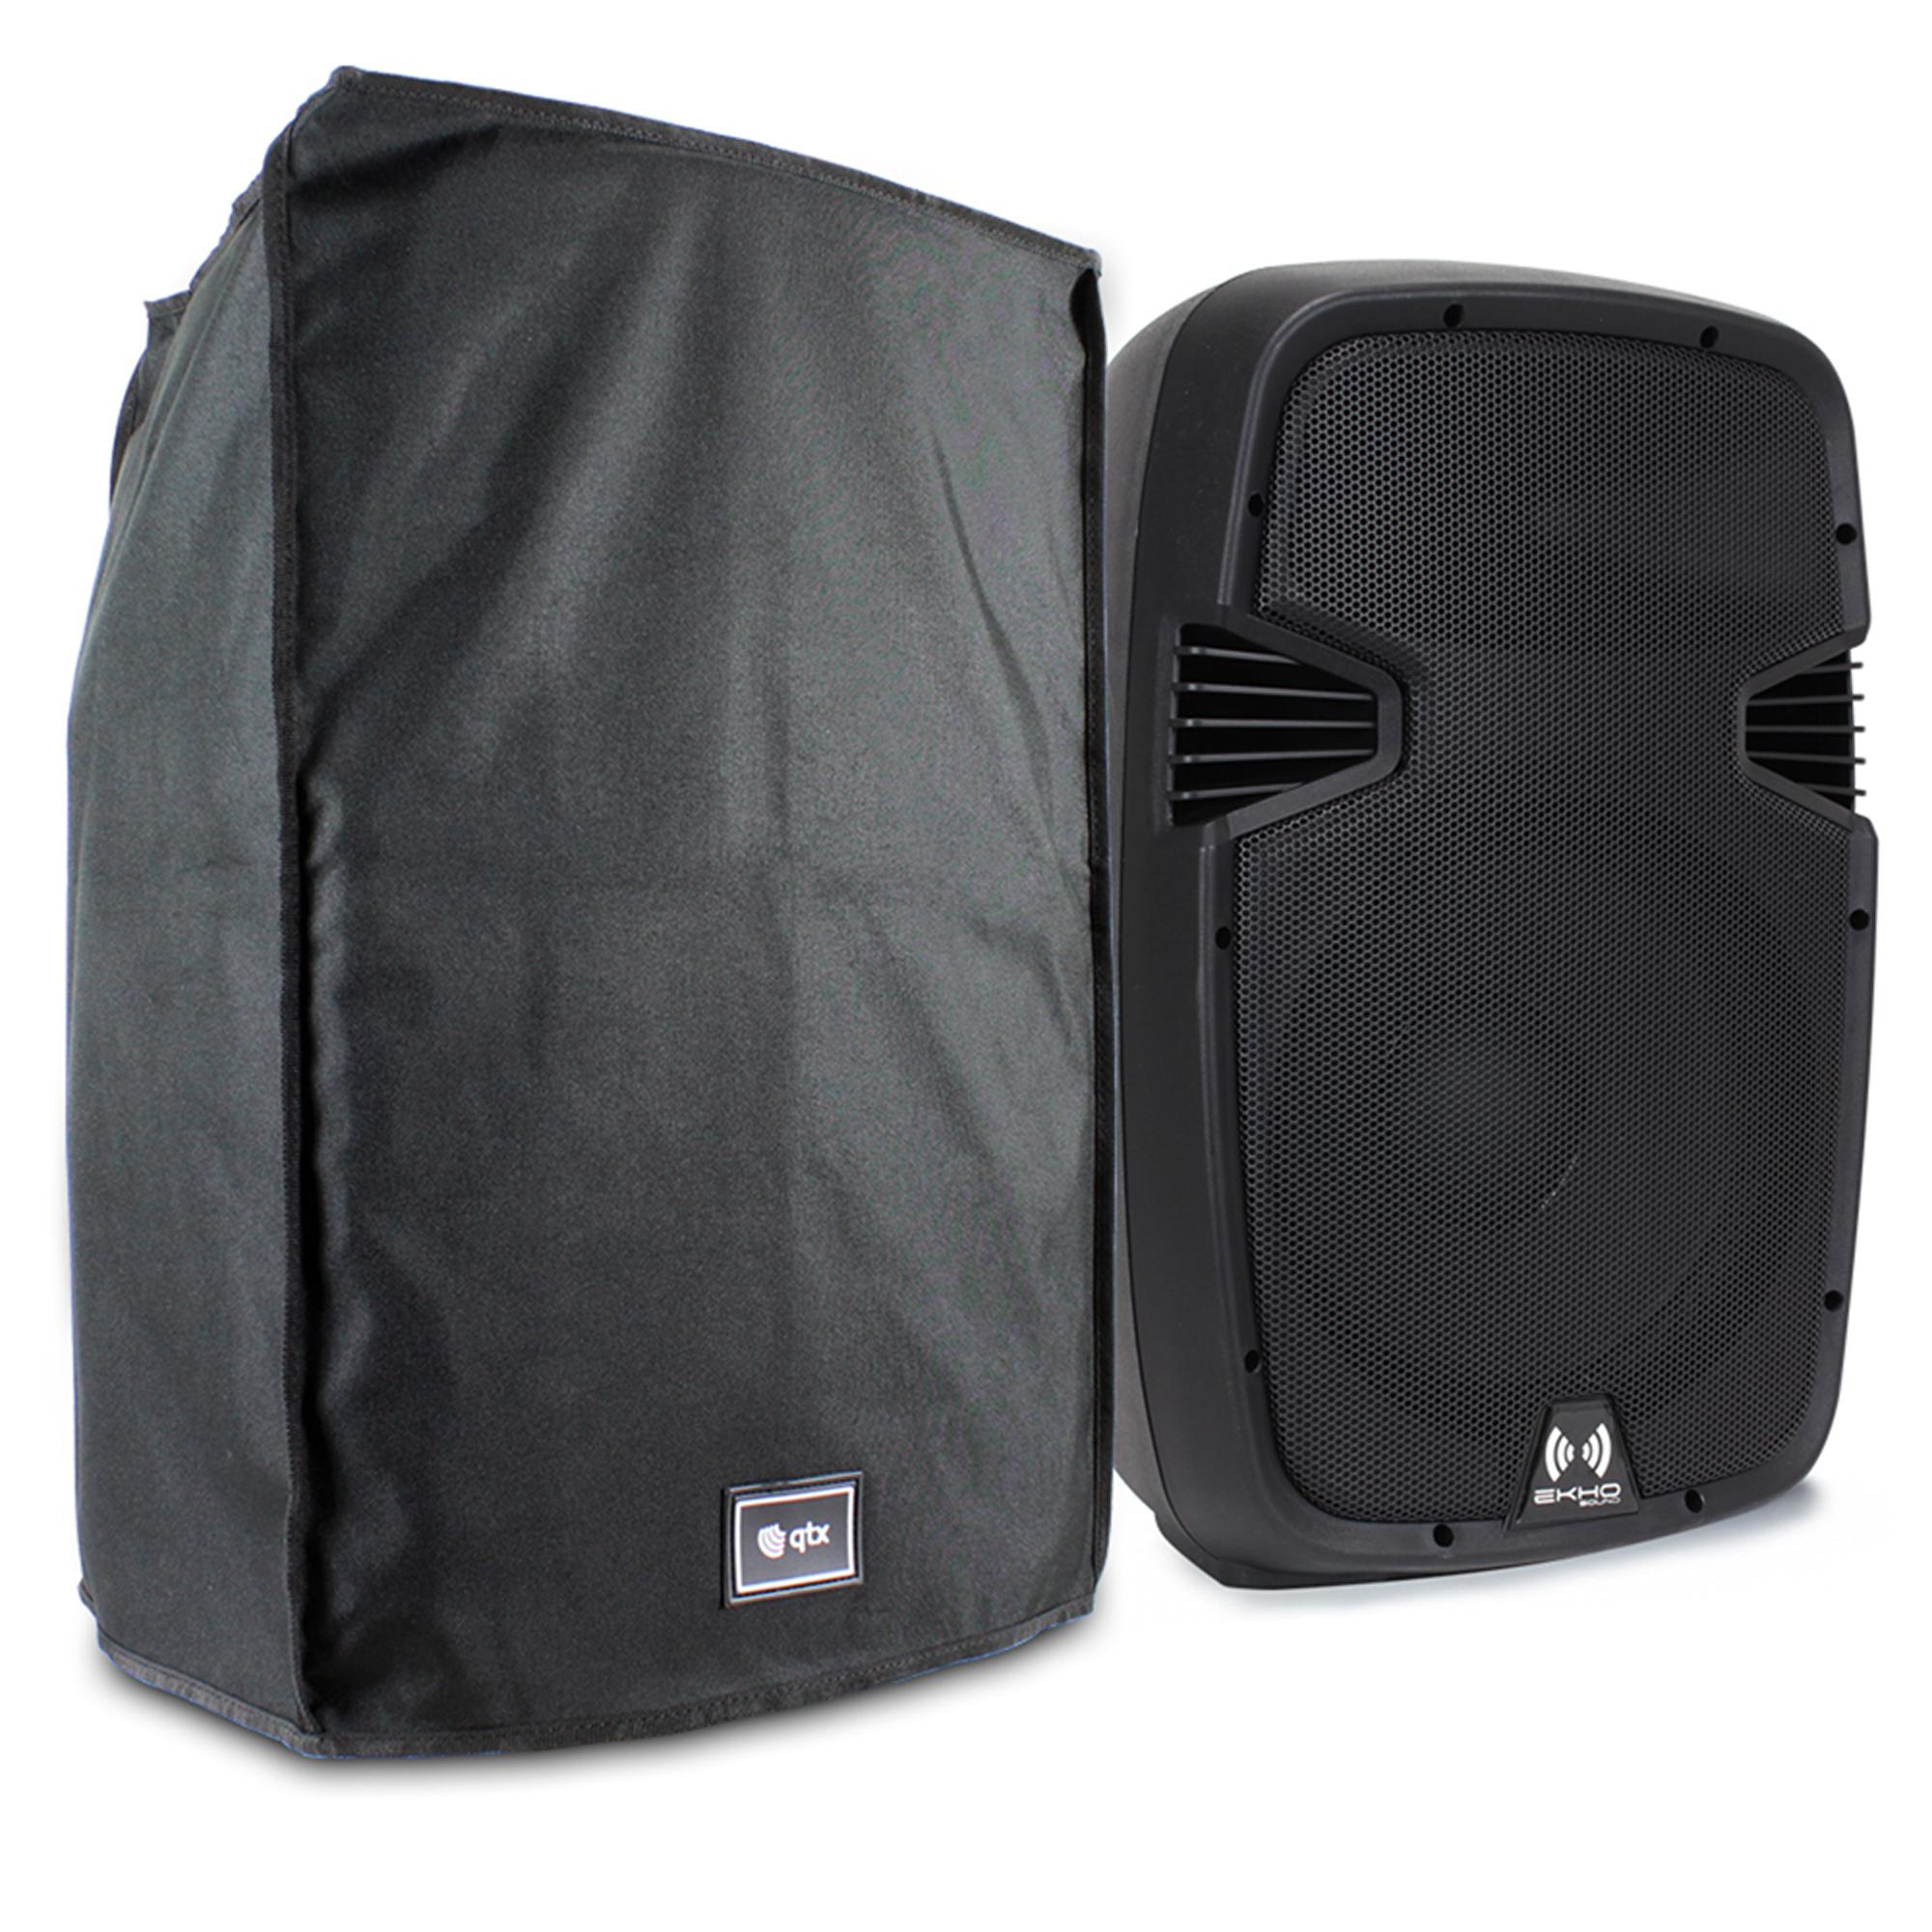 "Ekho RS12A 12"" Active Speaker & Water-Resistant Speaker Cover"